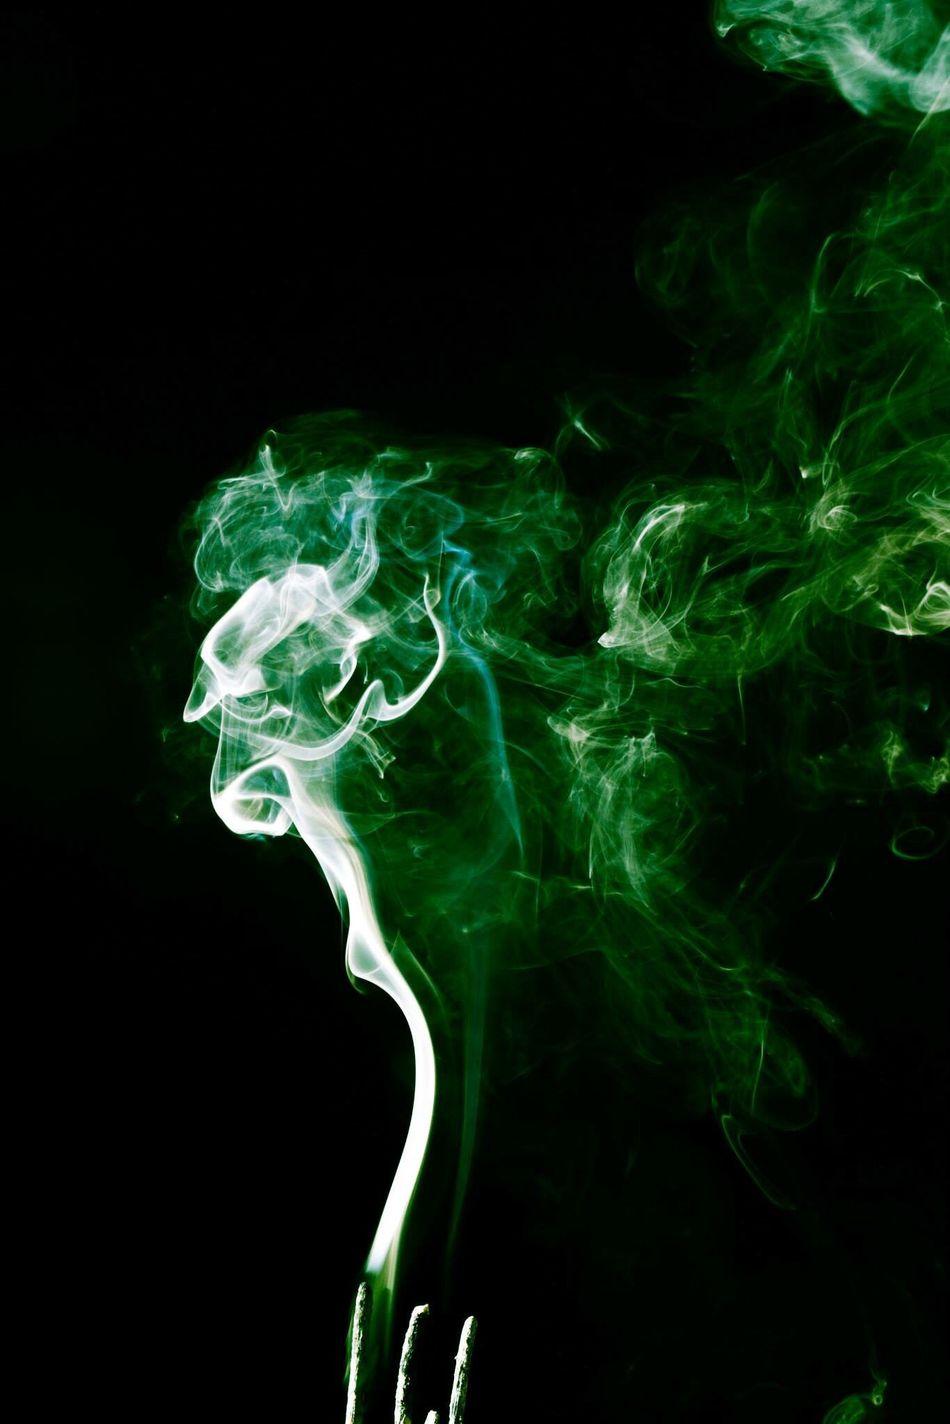 Ther a lady in the smoke if u can see it Smoke Art, Drawing, Creativity Art Pastel Power Dark Photography Showcase March Blackbackground Lebanon Flash Green Green Smoke Wood - Material